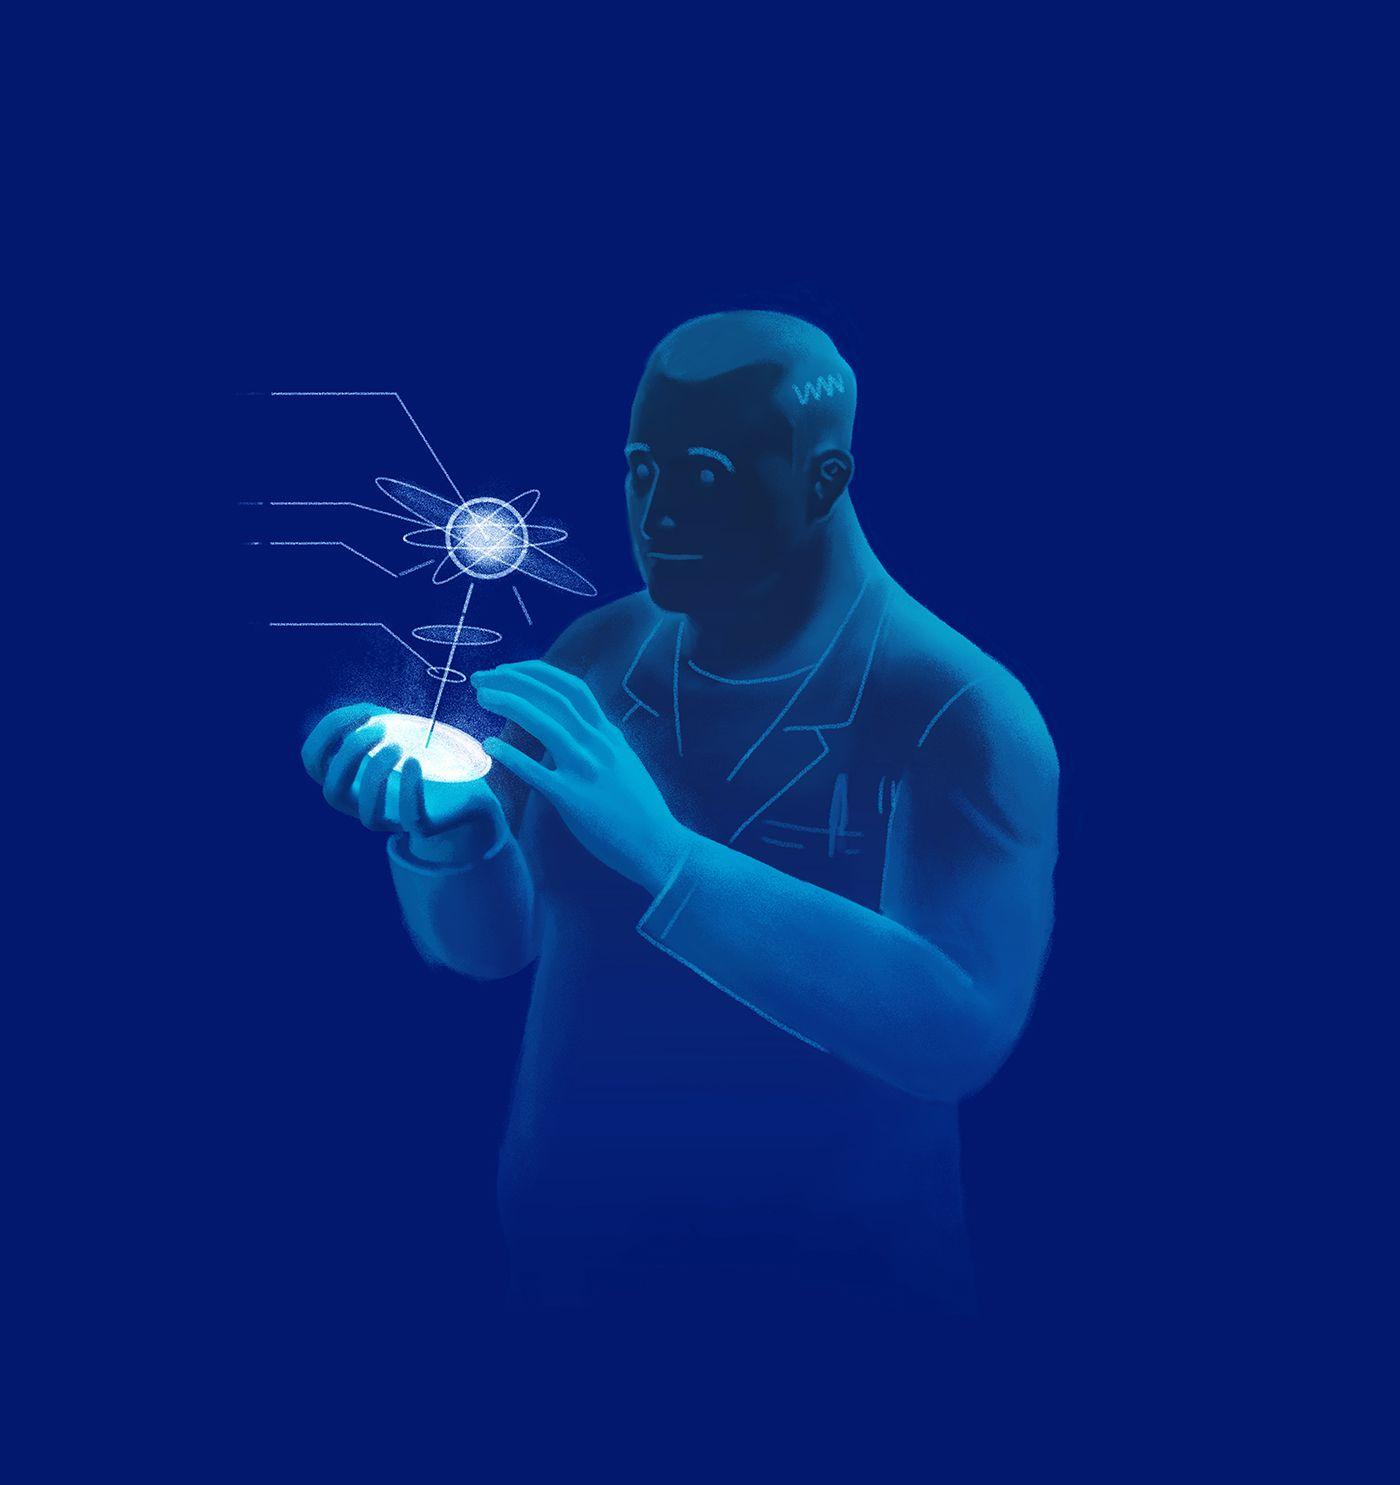 Science on behance editorial illustration illustration